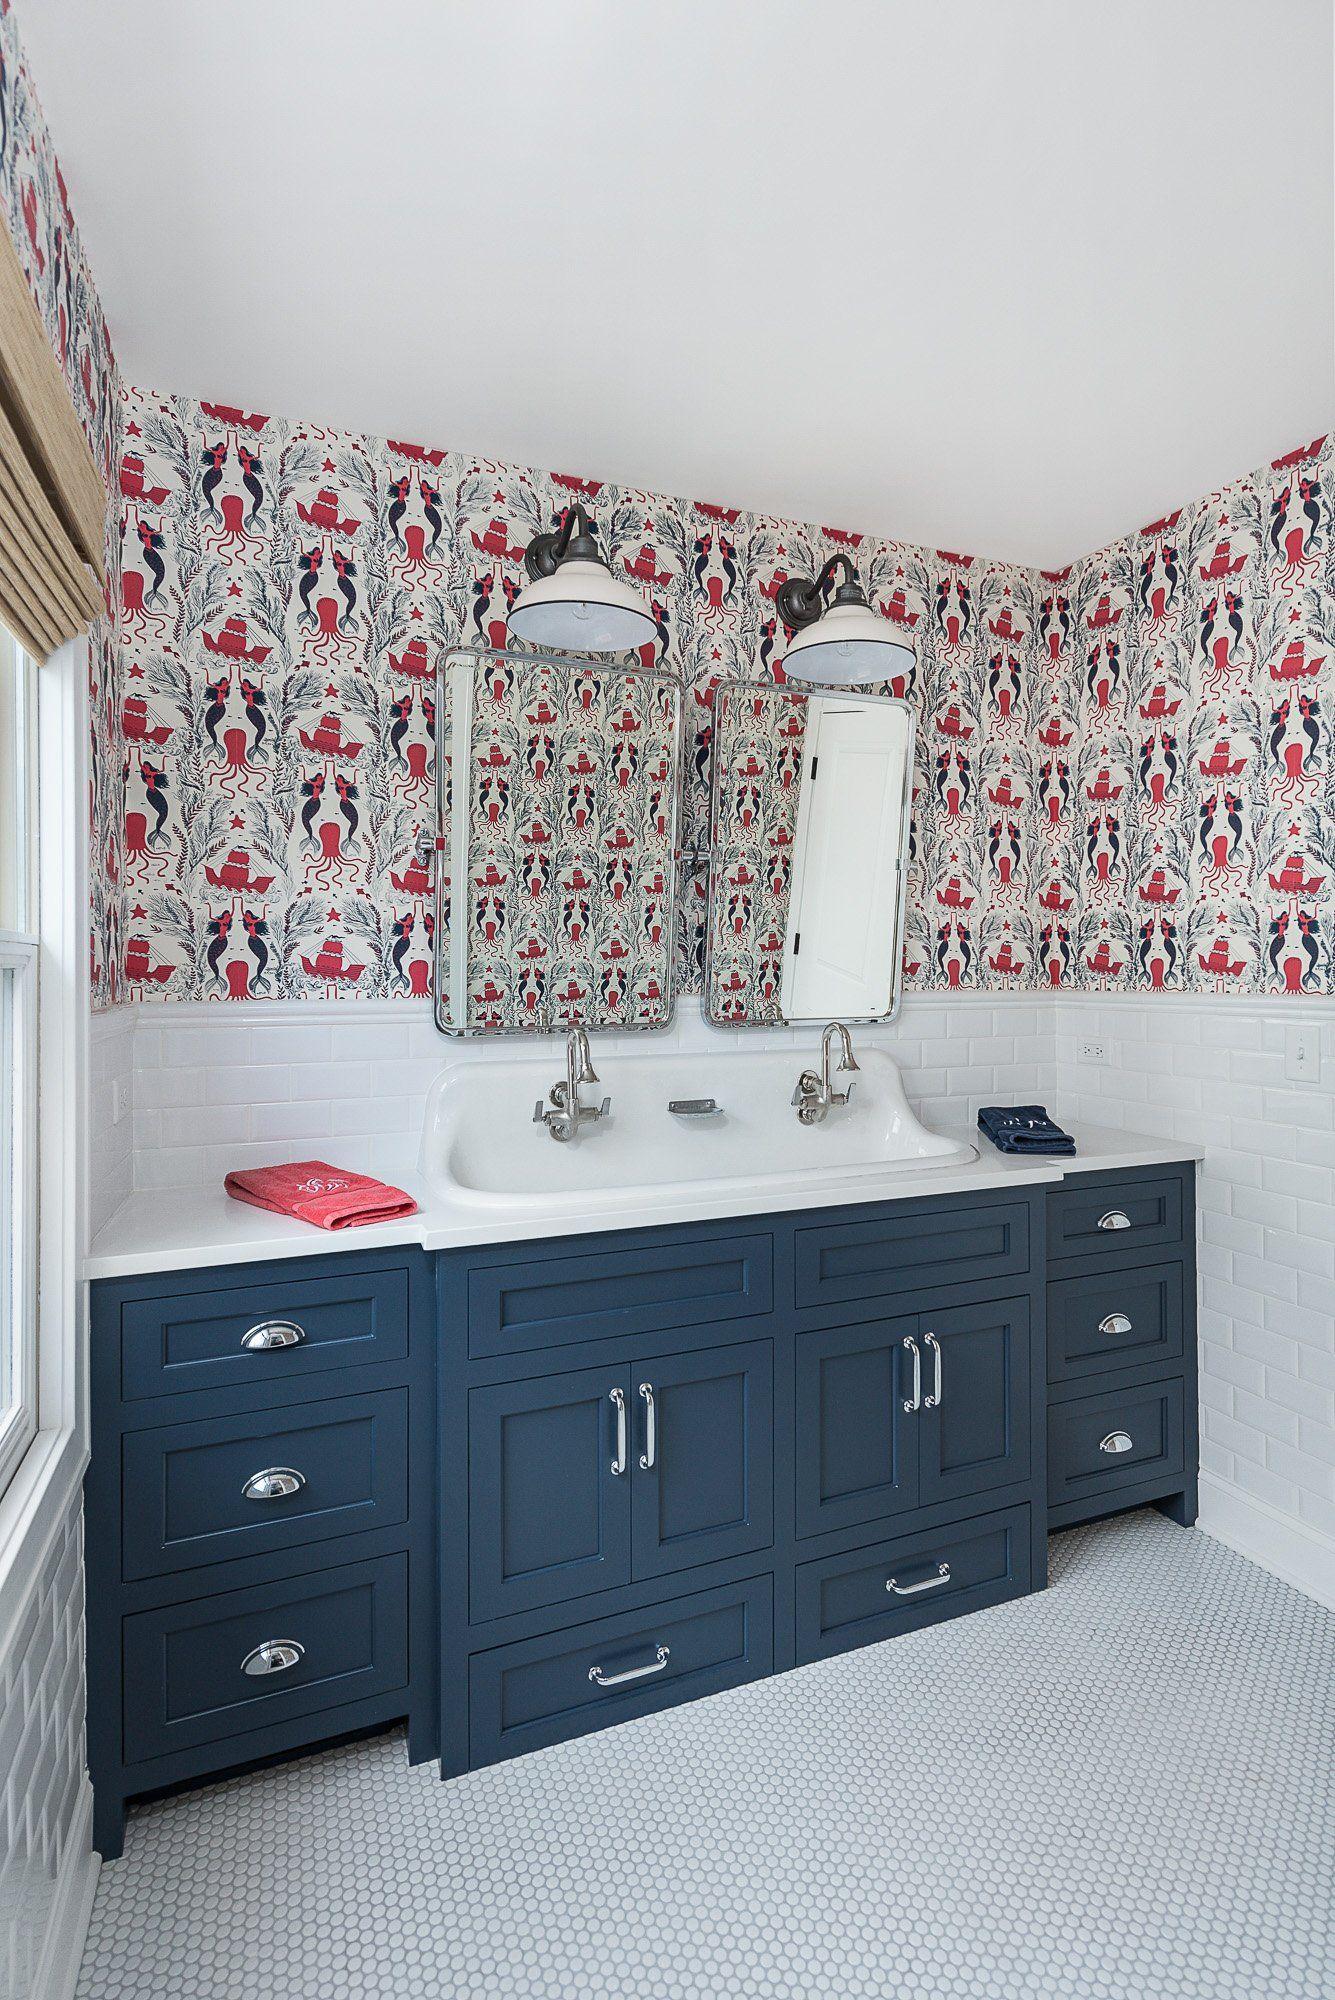 Mermaid Spotting Home interior design, Small bathroom